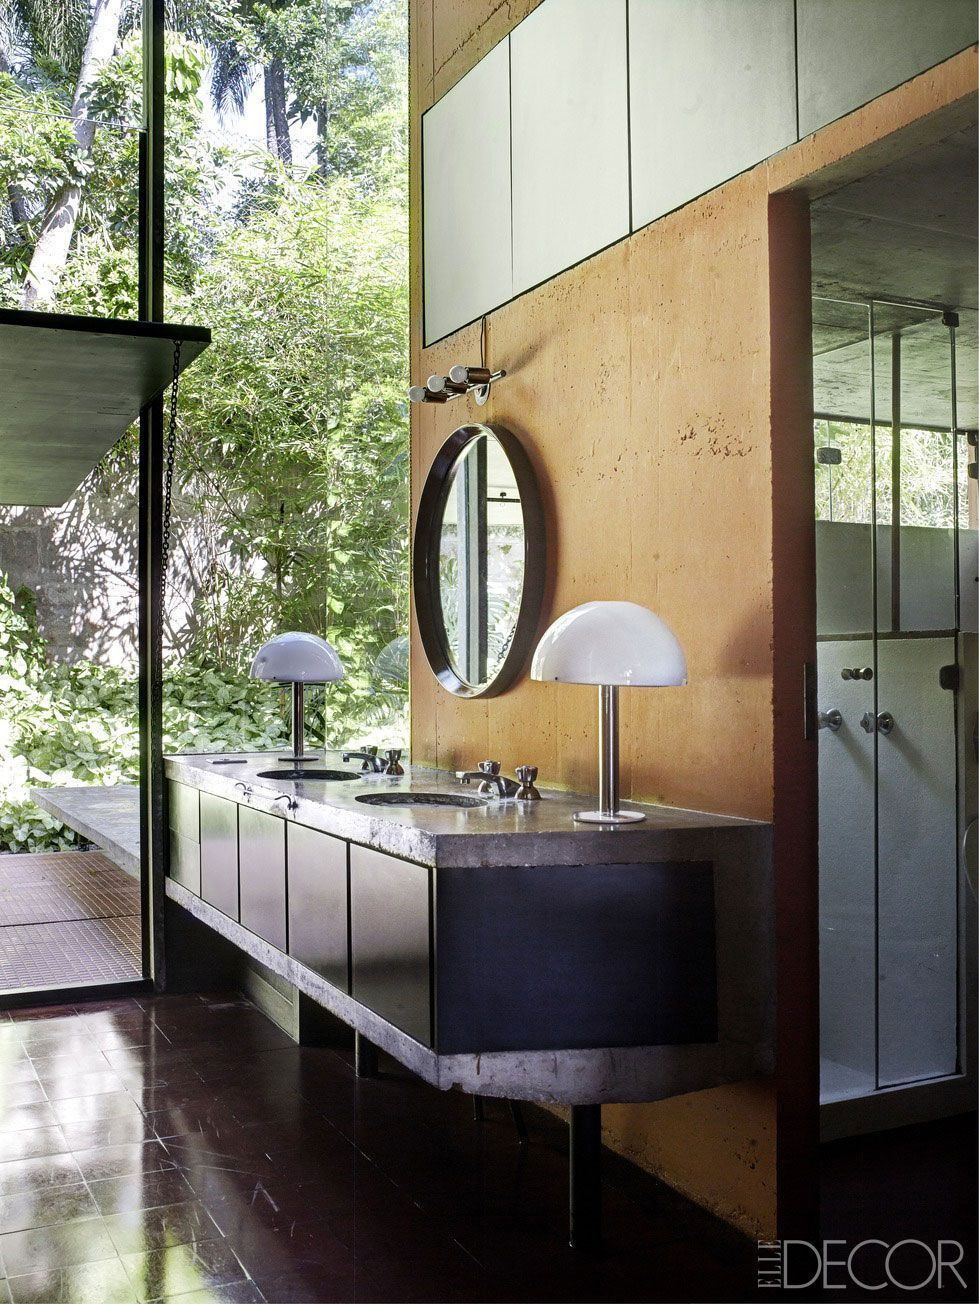 HOUSE TOUR: An Architect's Modern Retreat In Brazil | Baño ...